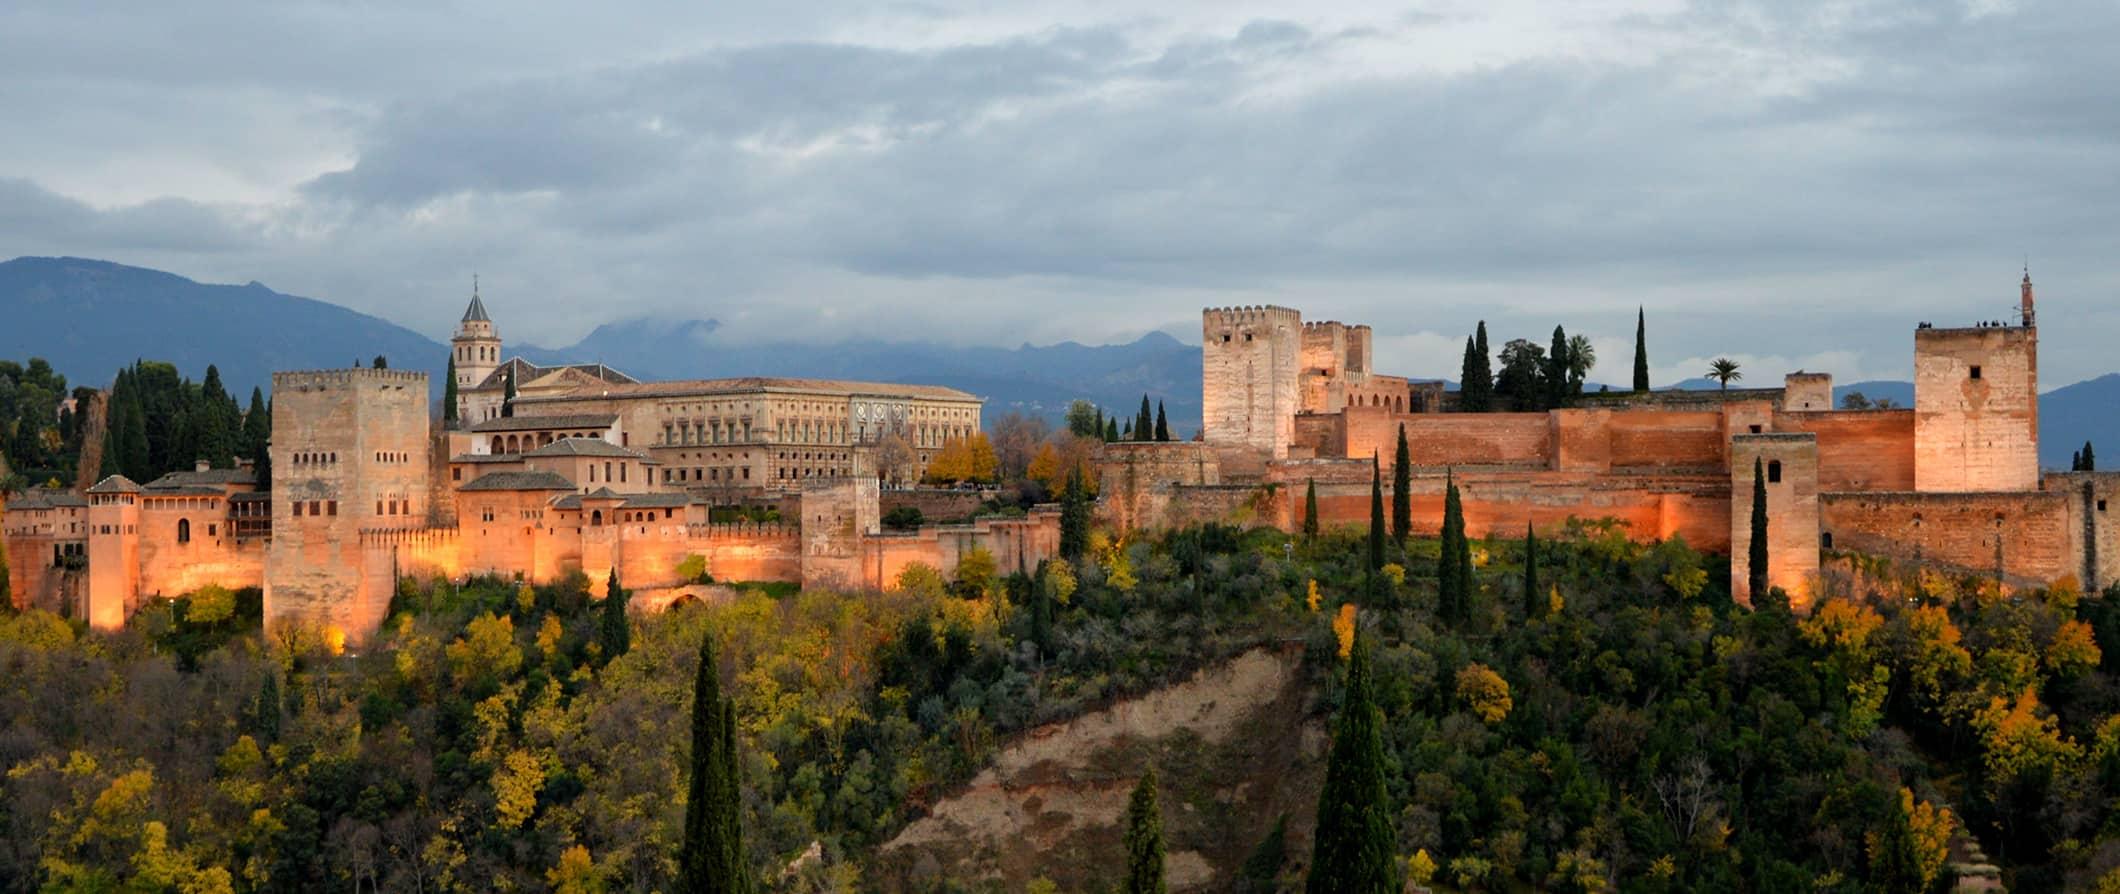 the castle in Granada, Spain